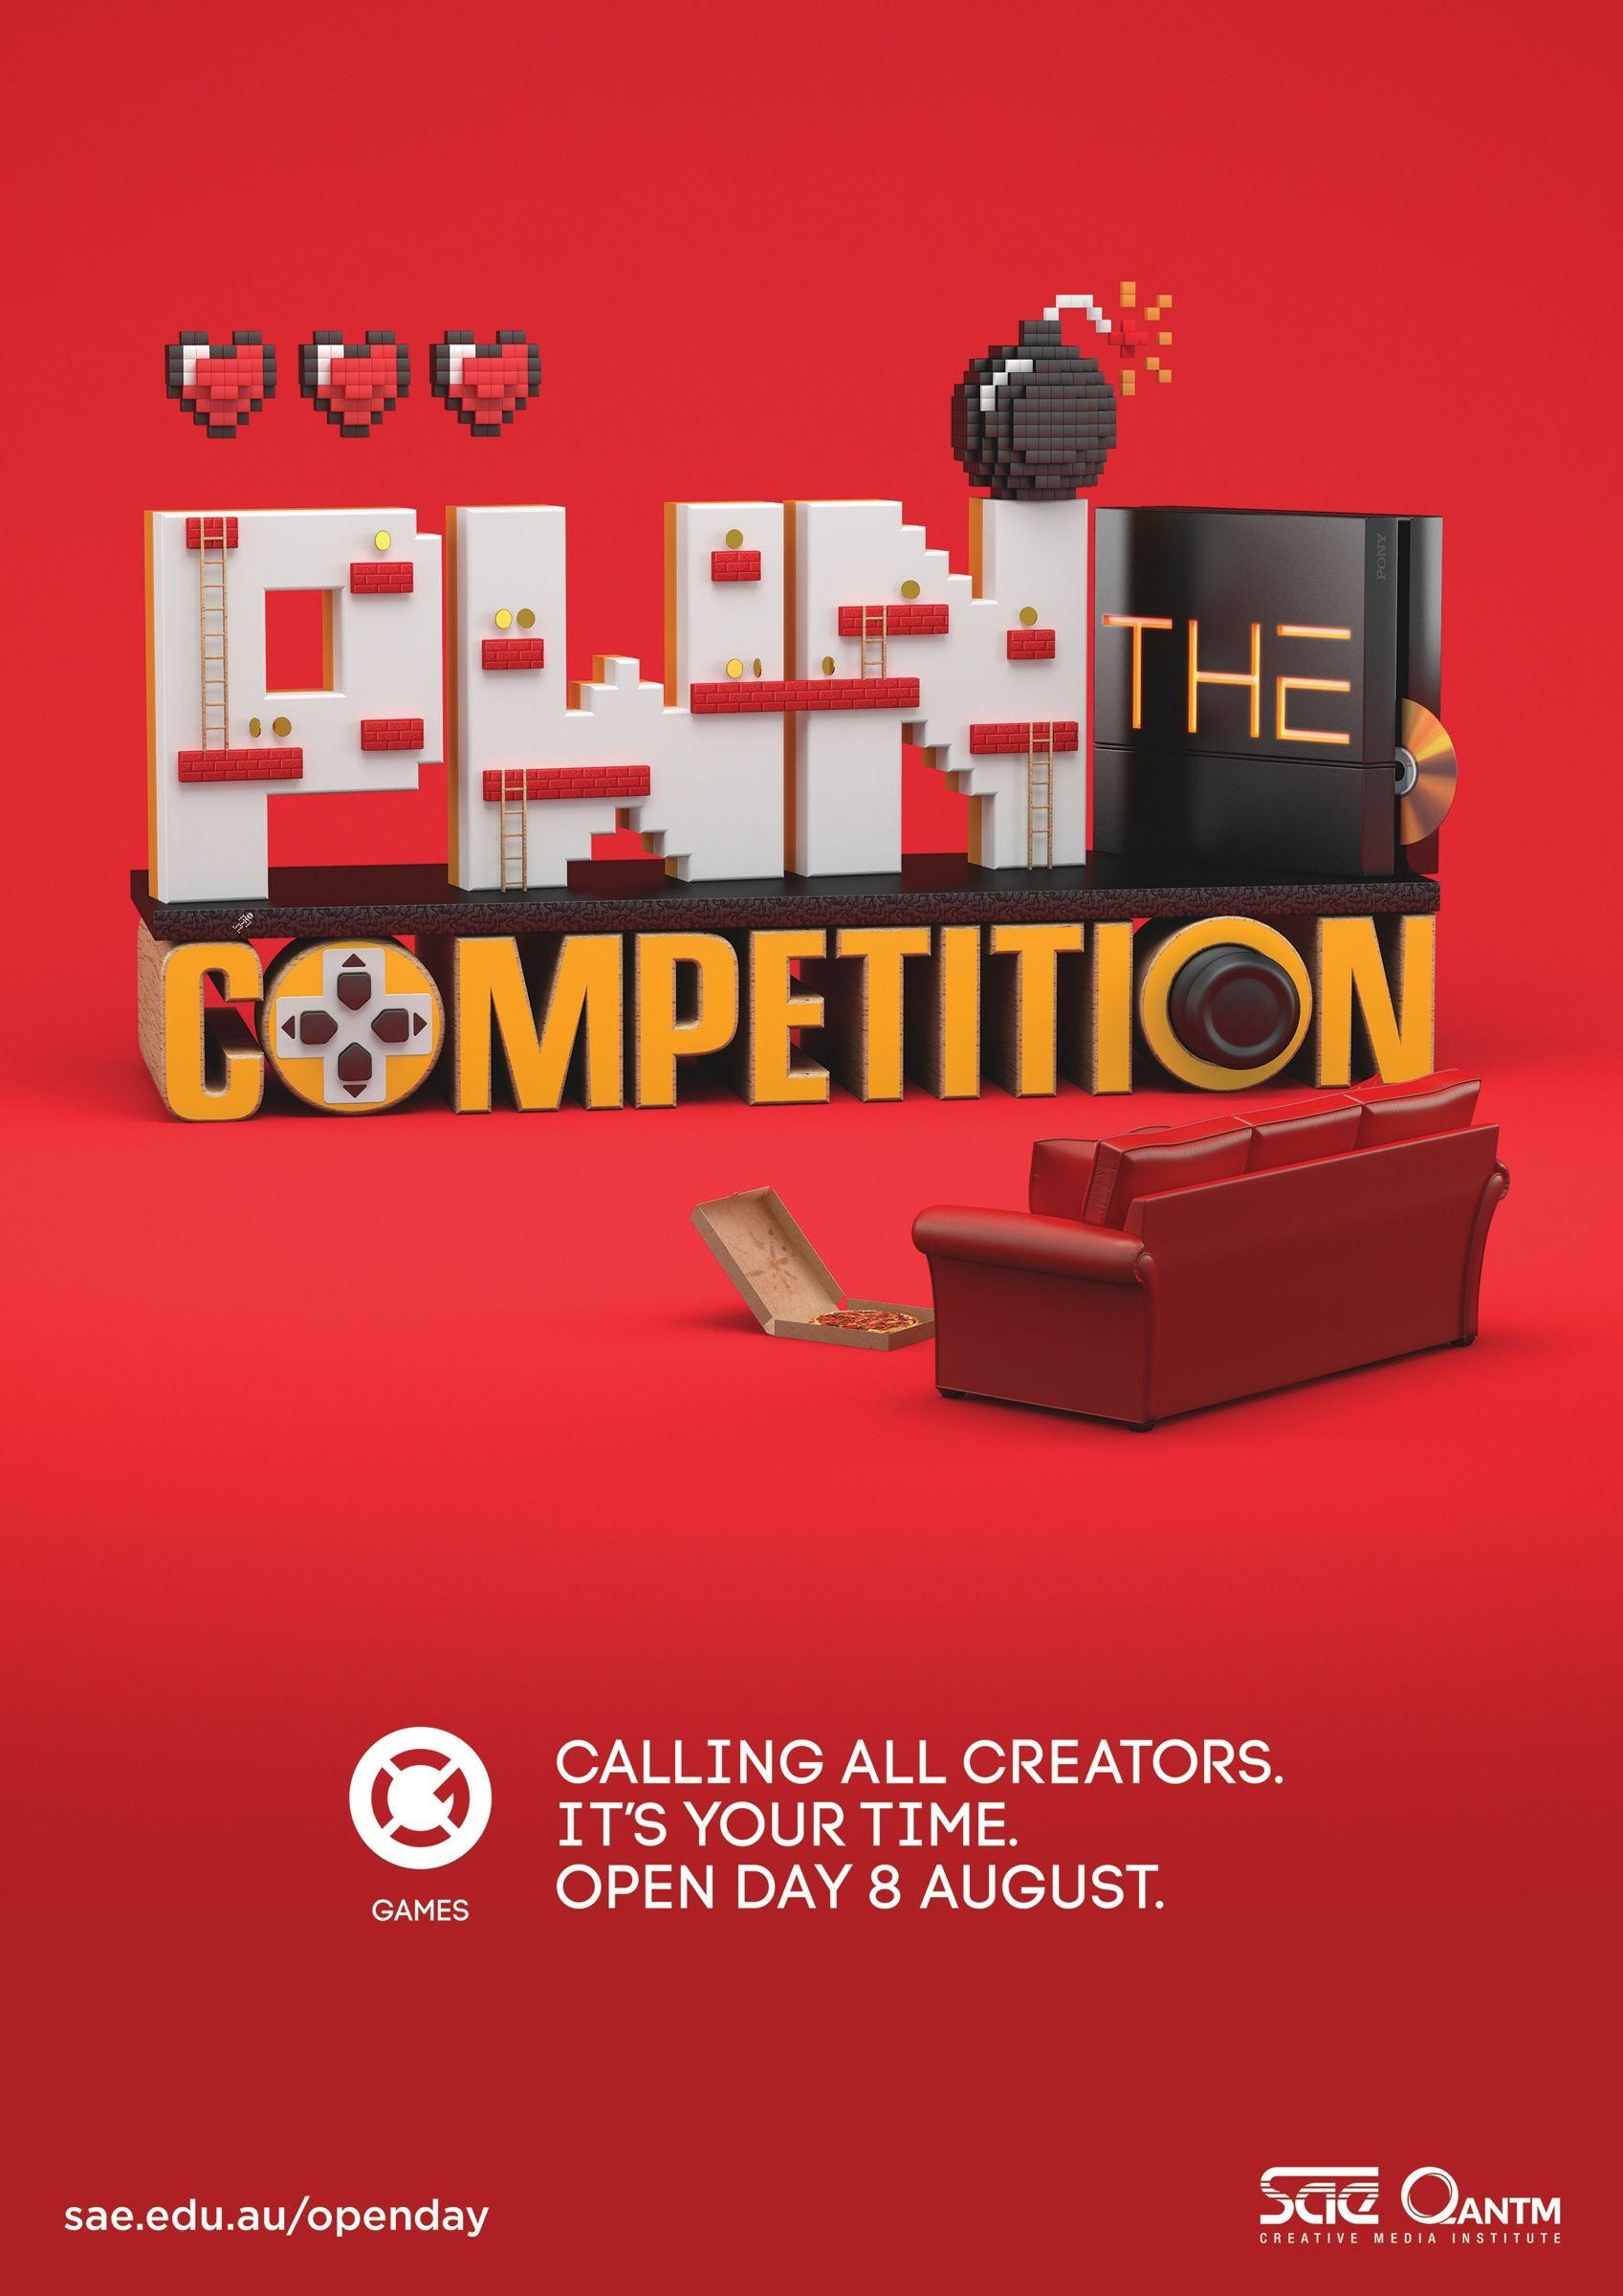 Sae Qantm Creative Media Institute Creative Digital Advertising Opening Day